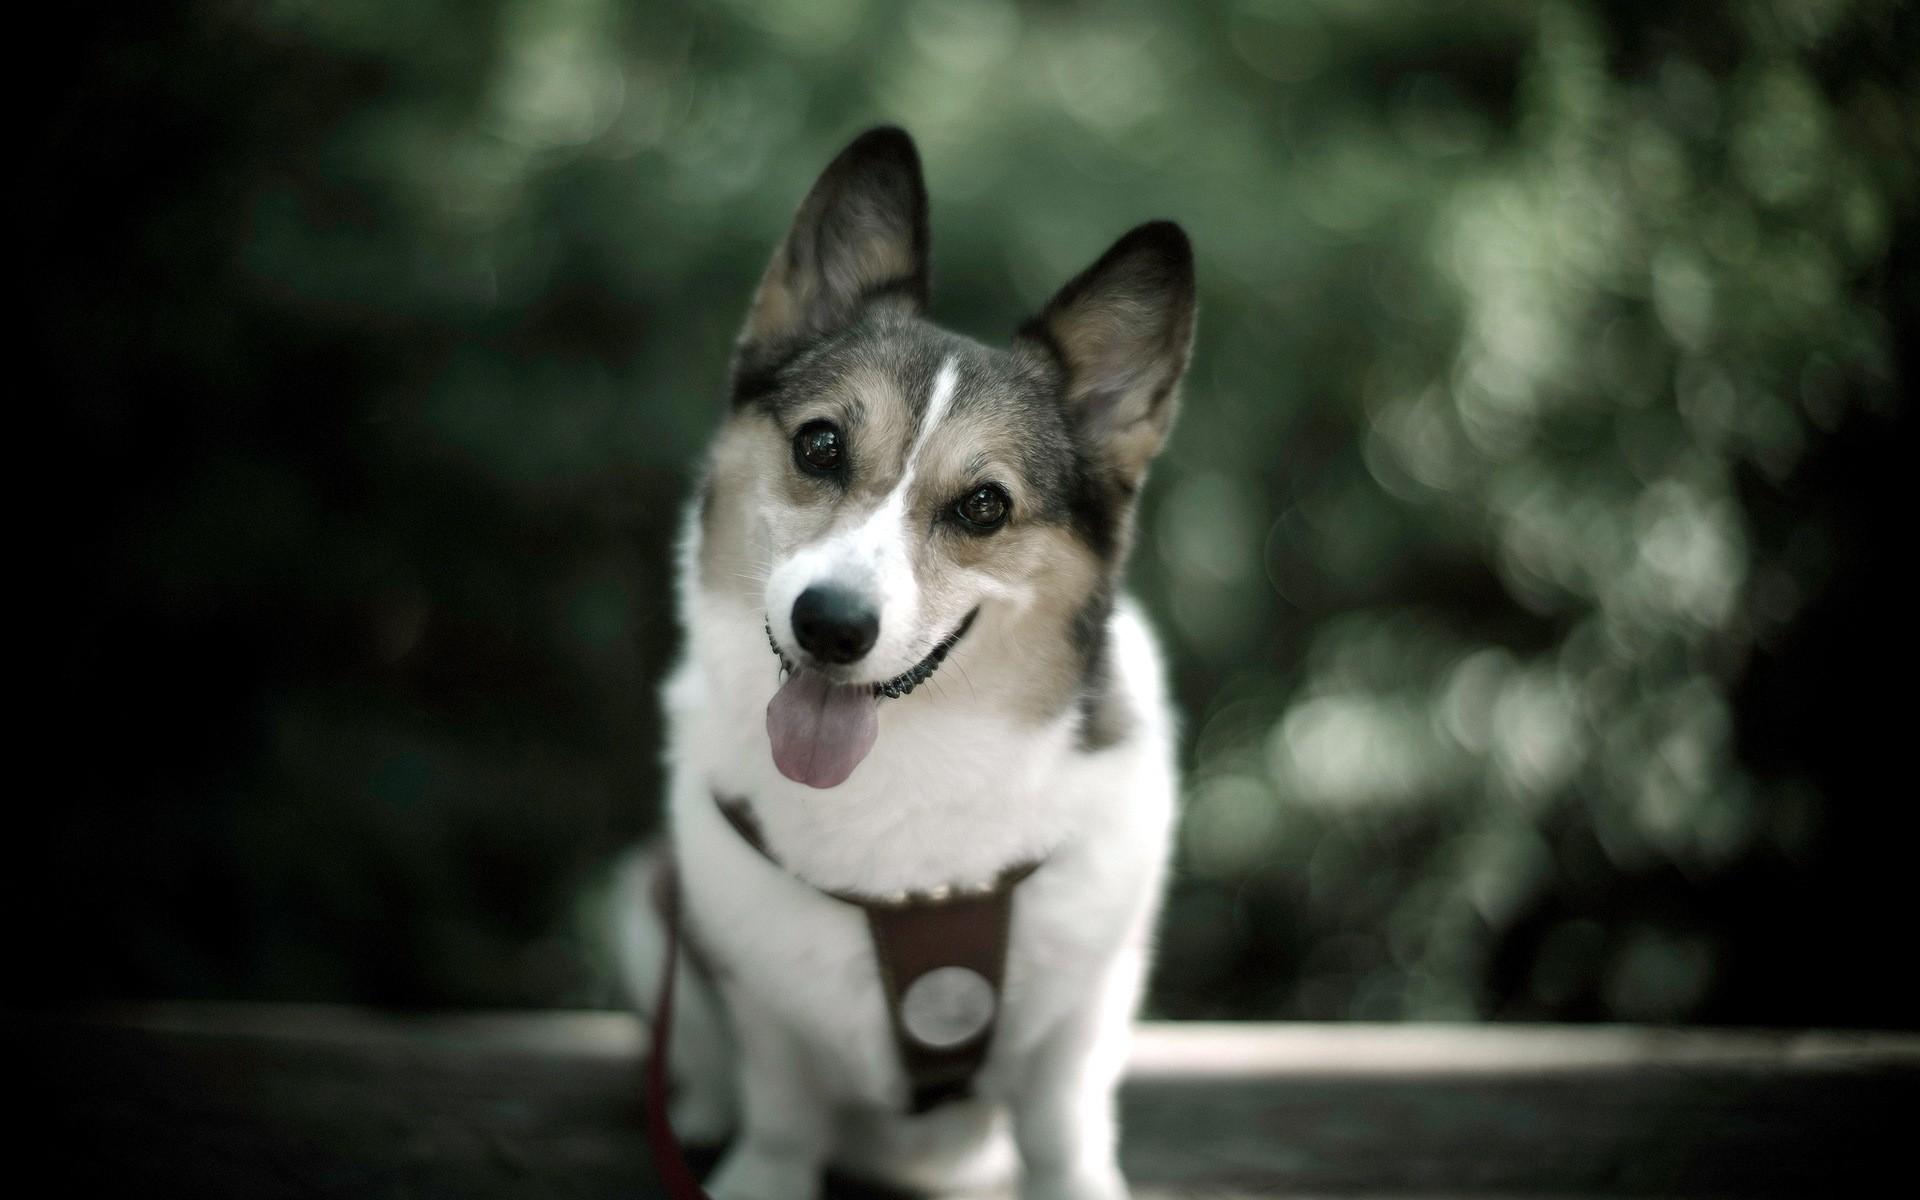 CUTE-DOG-wallpaper-wp5604145